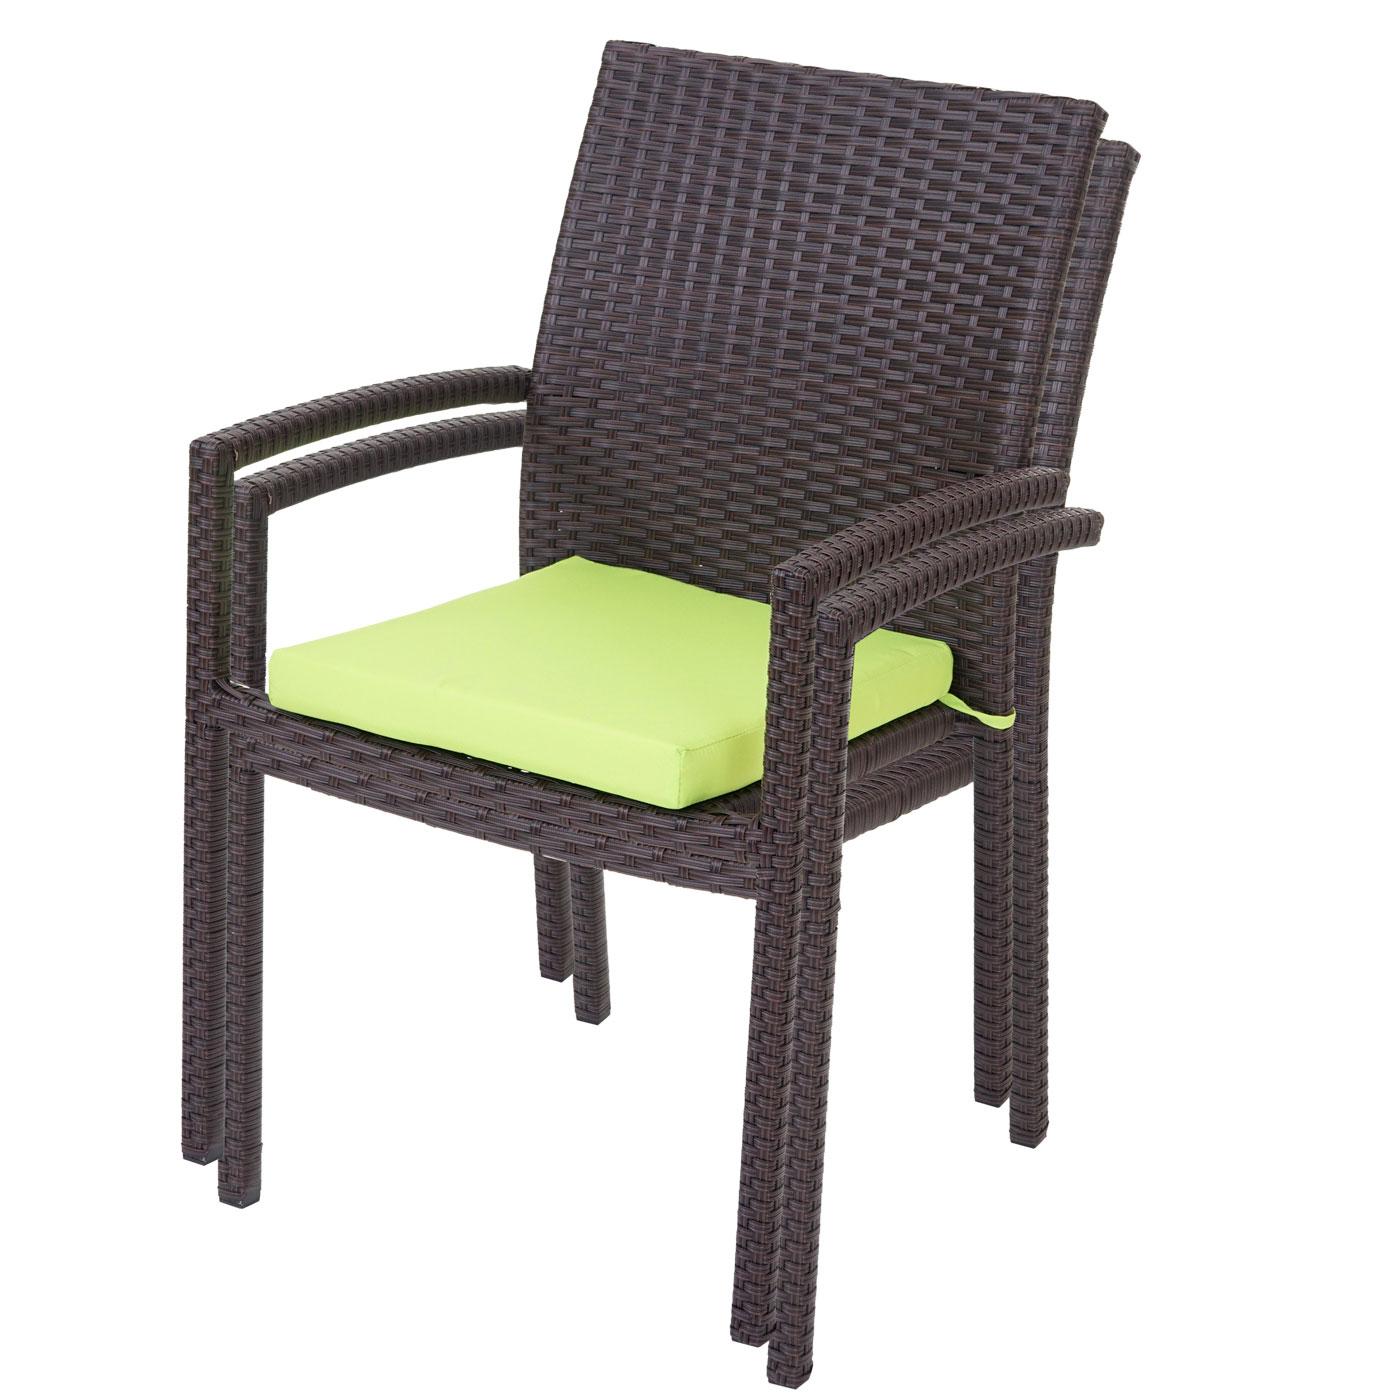 B-Ware  1x Poly-Rattan Gartenstuhl Cava, Stapelstuhl inkl. Sitzkissen ~ braun, Kissen grün